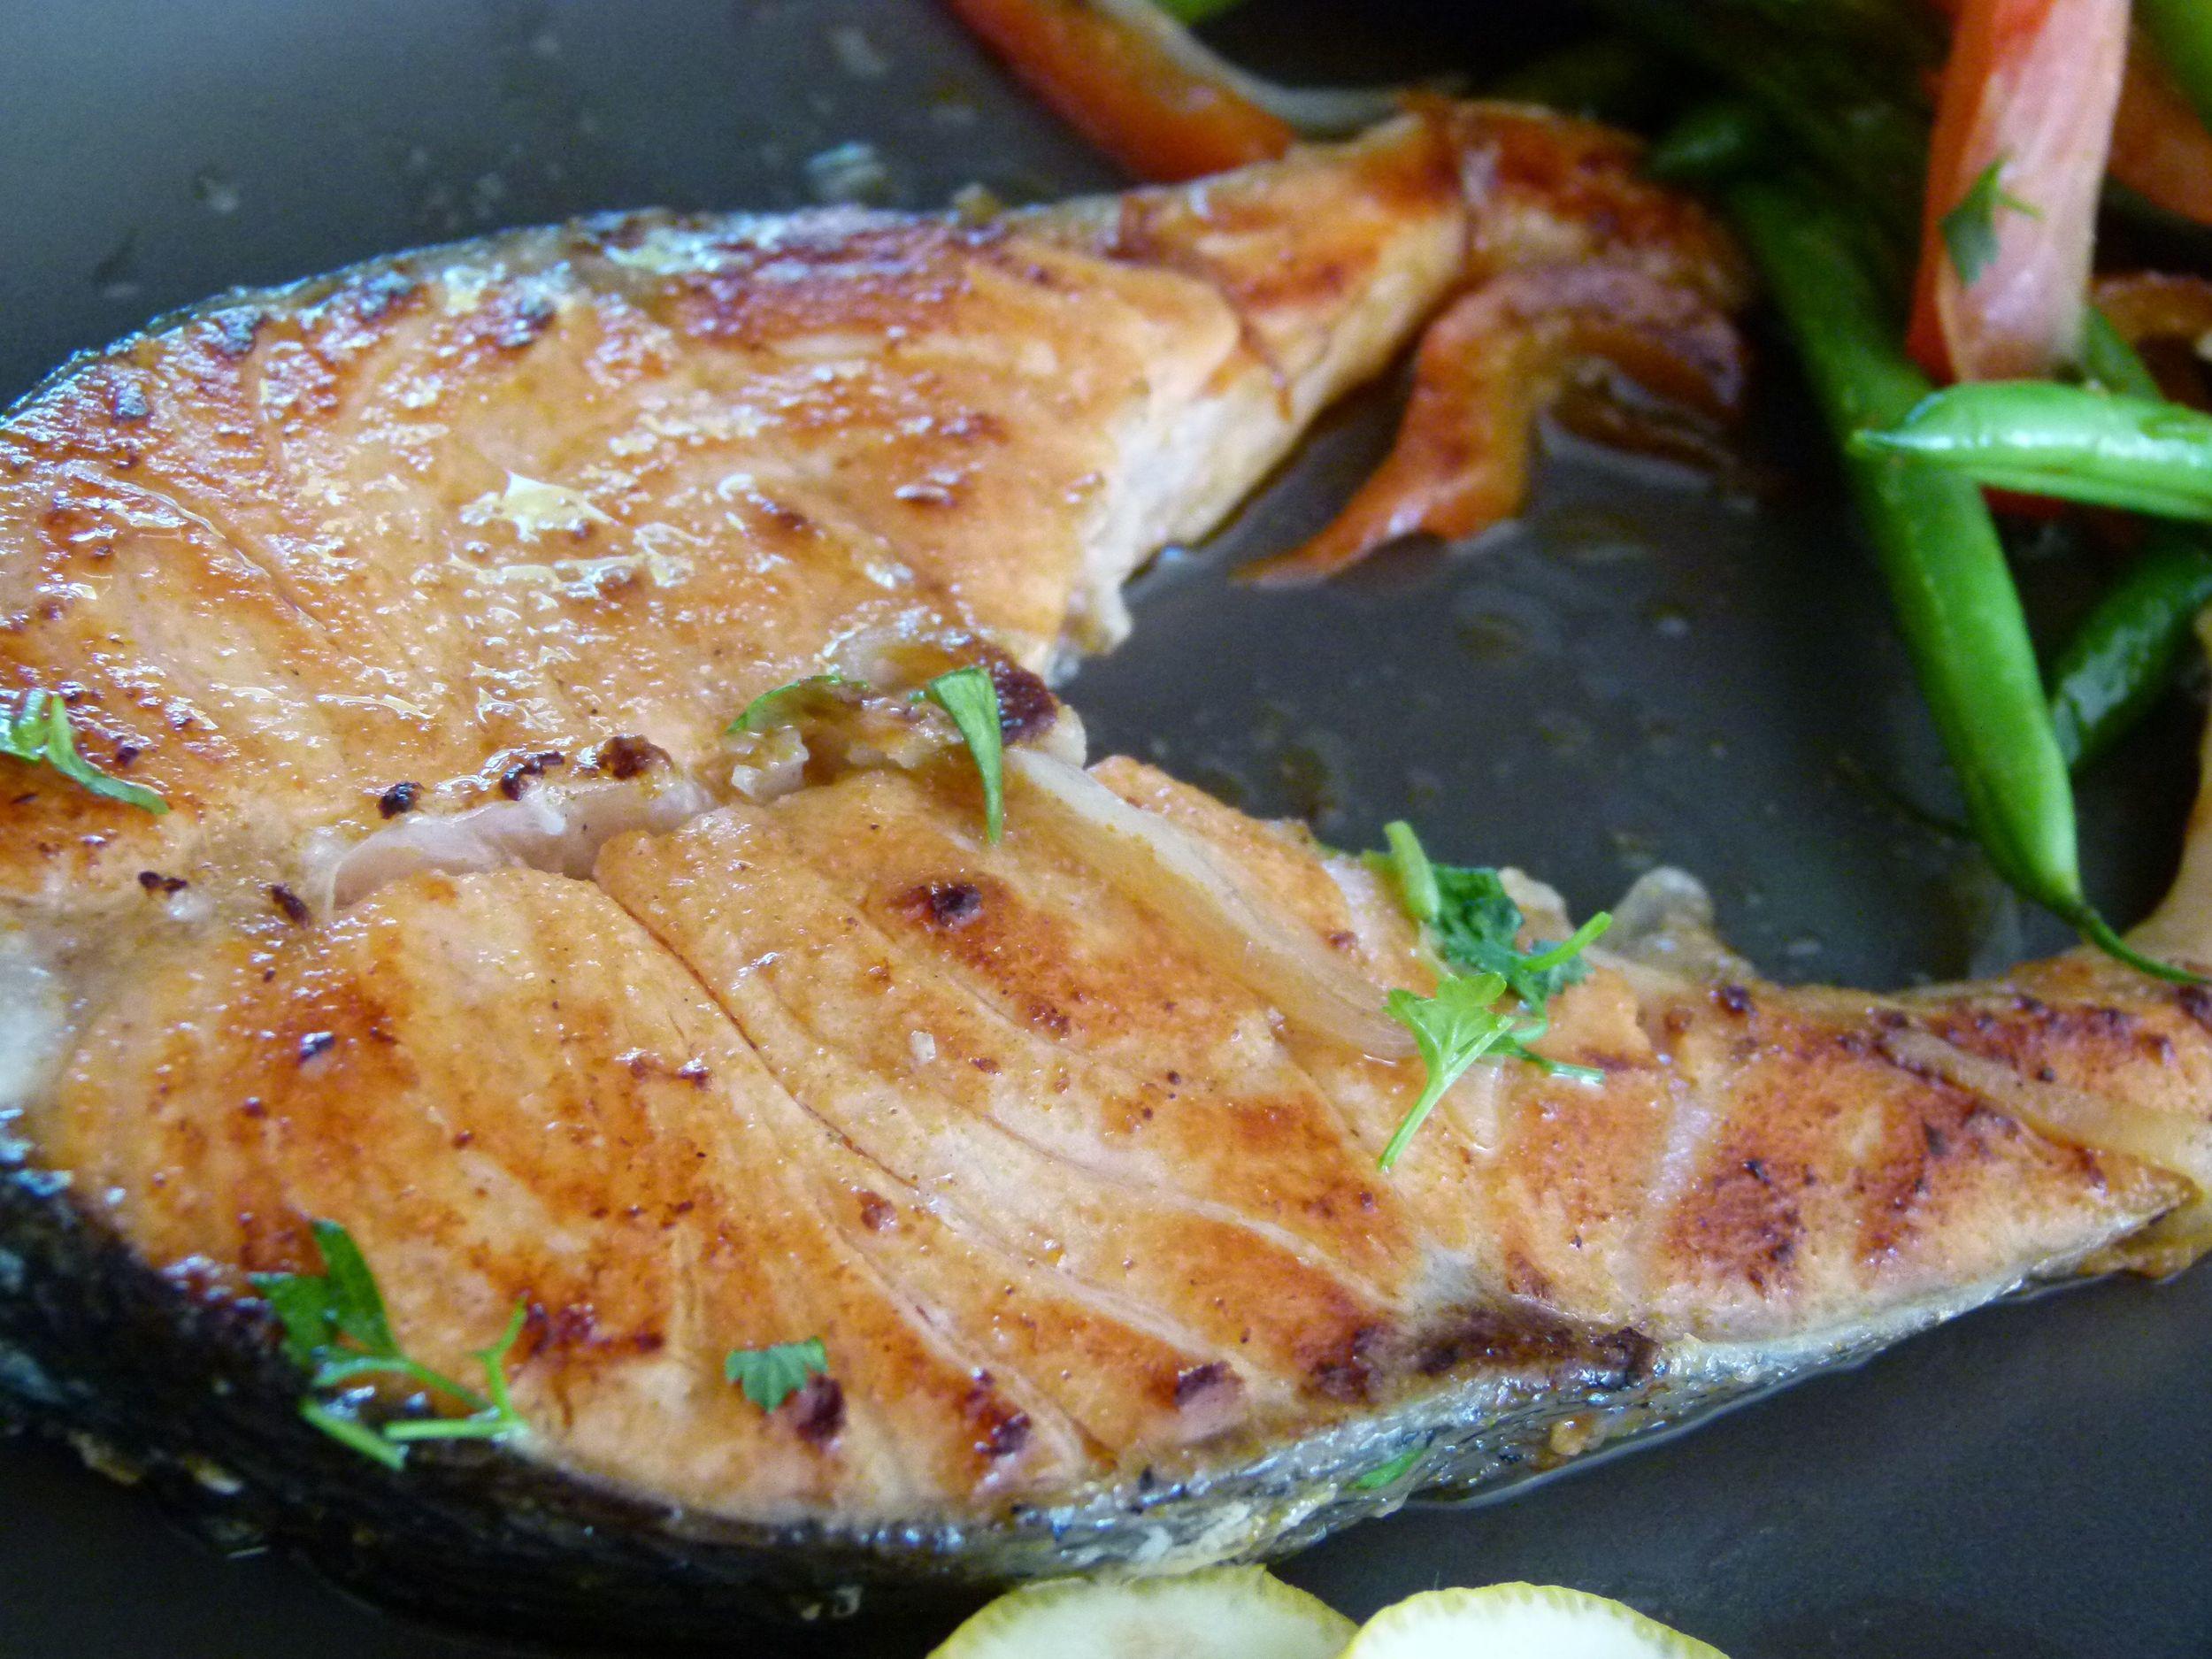 Salmón con sabores del sudeste asiático